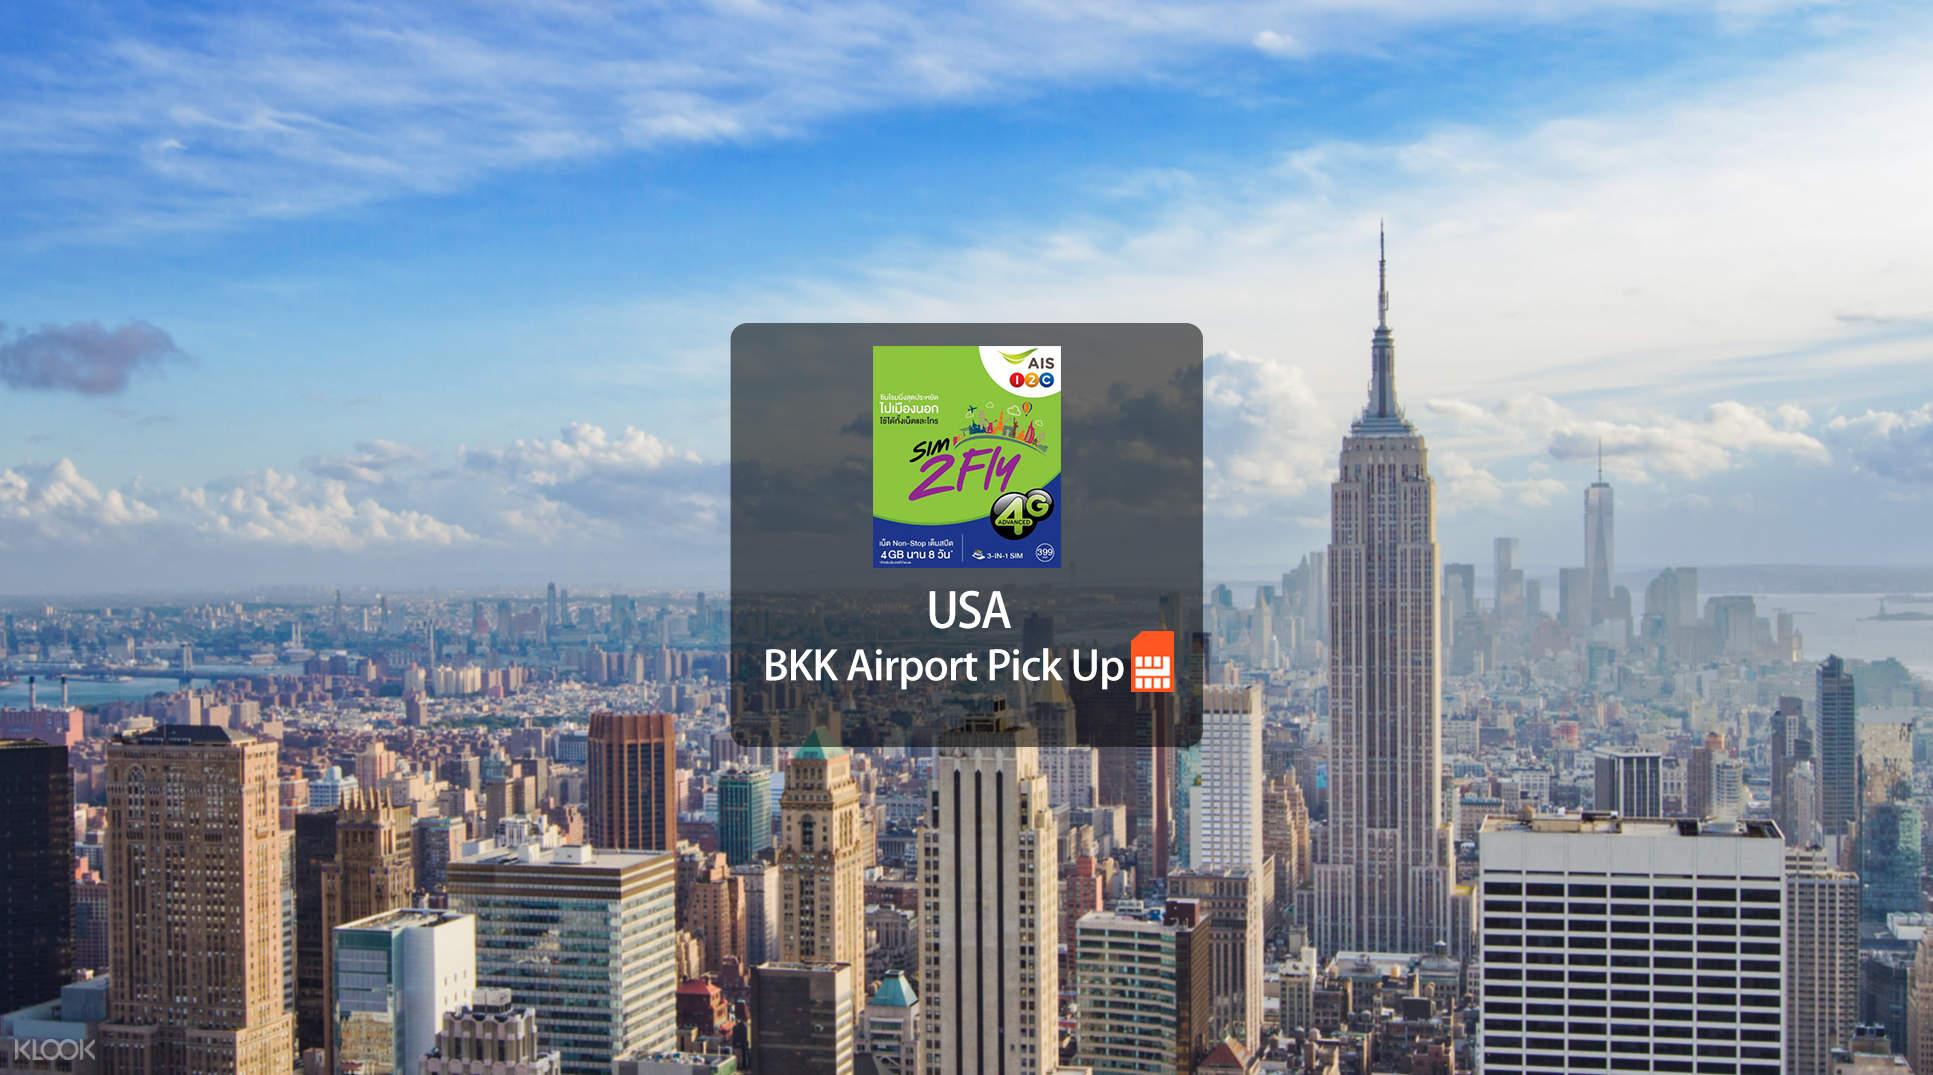 USA Prepaid 4G SIM Card (BKK Airport Pick Up) from AIS - Klook